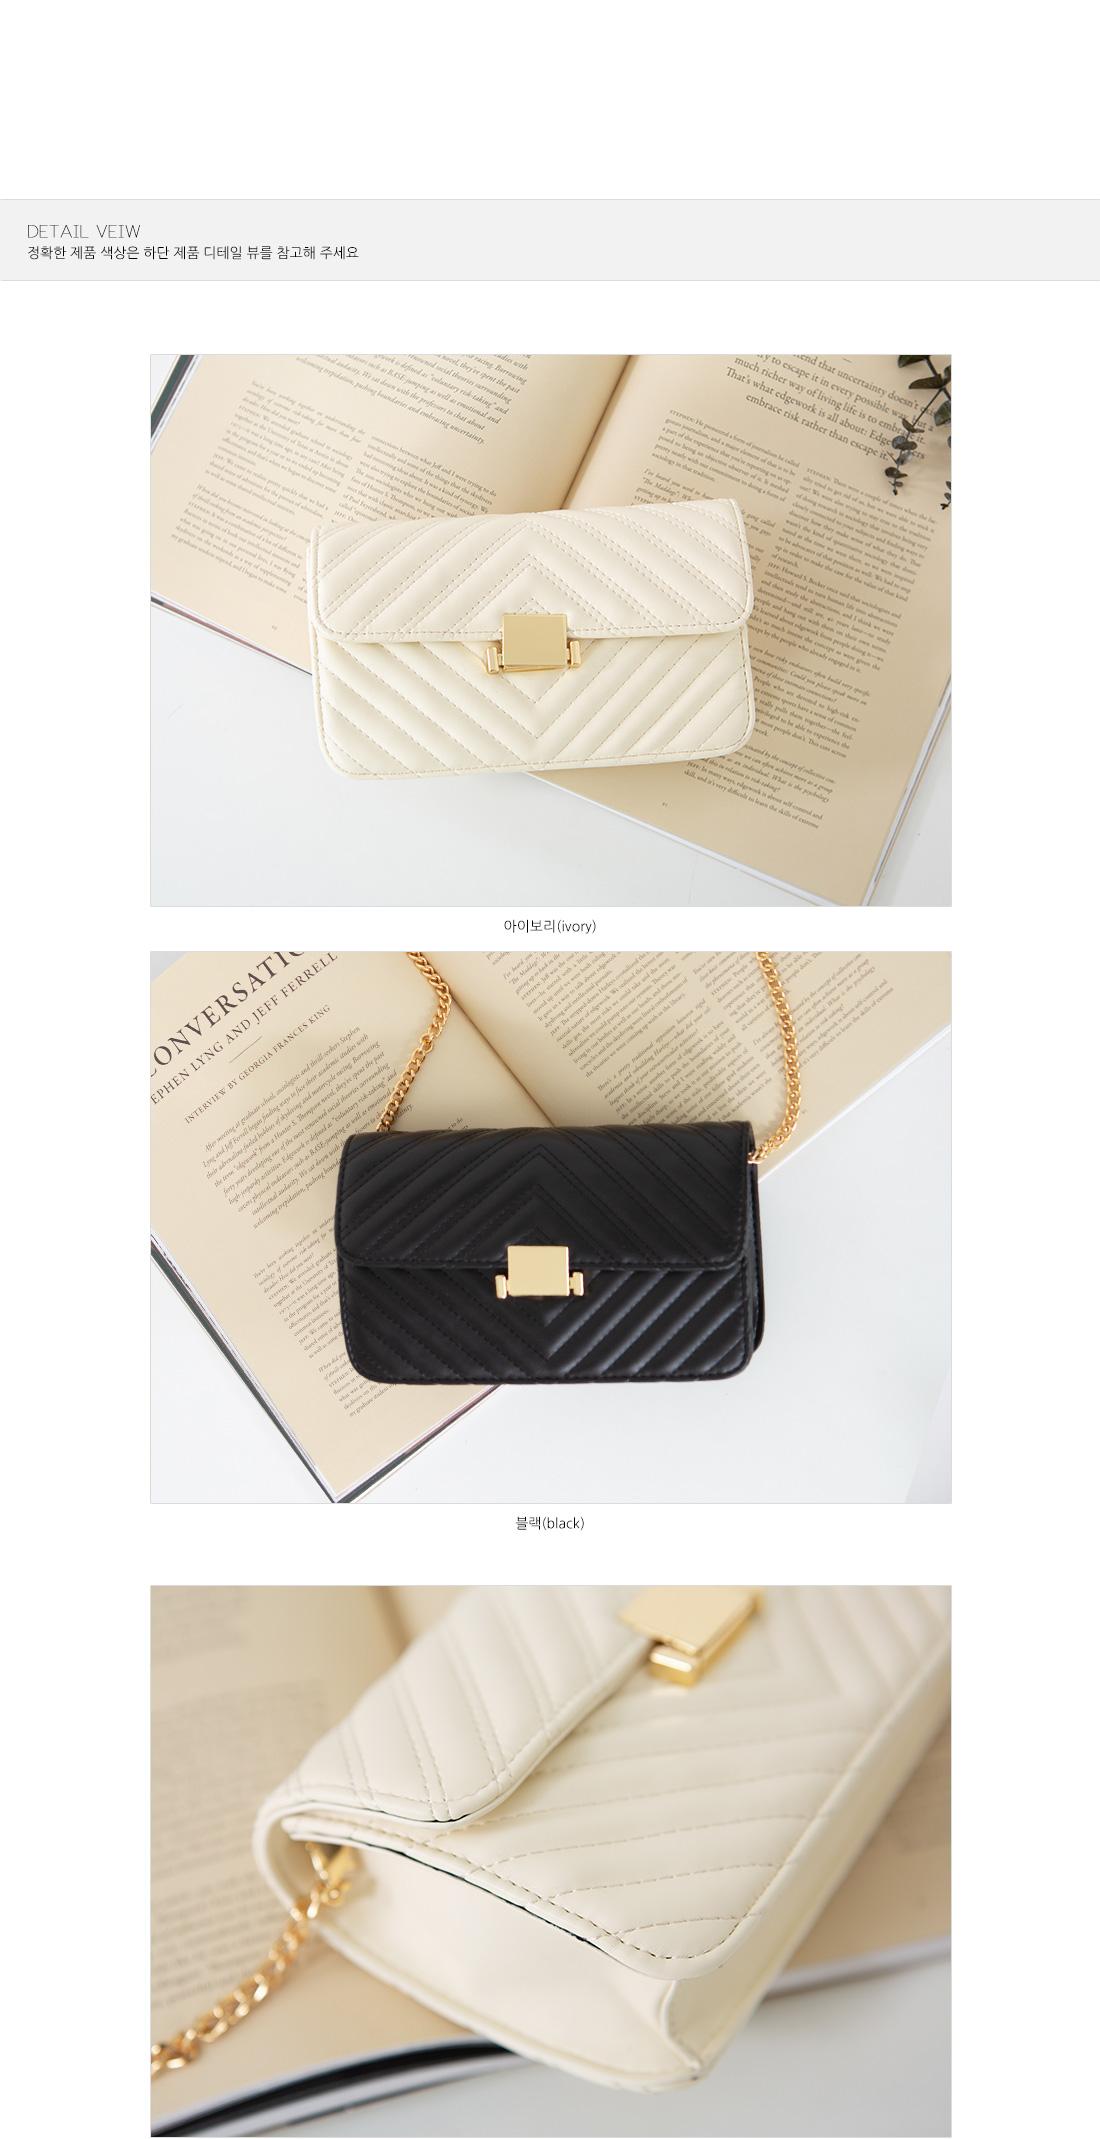 Daily Quality Chain Bag #85559